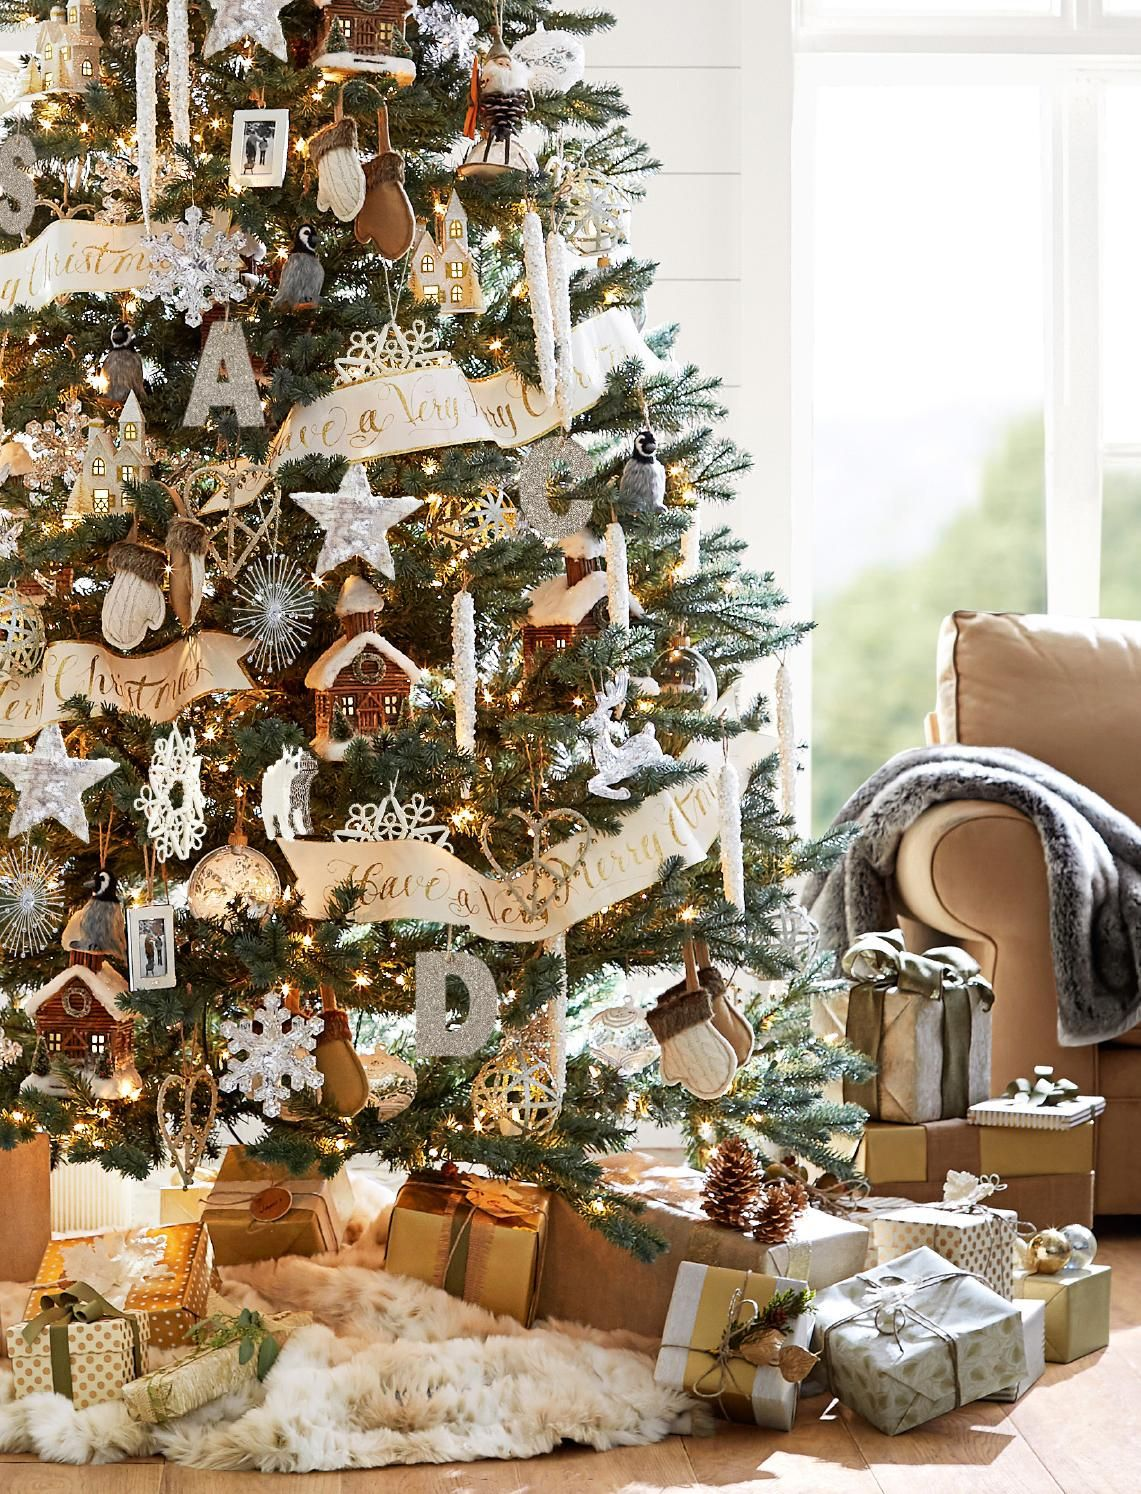 Williams Sonoma Christmas Catalog.Pottery Barn Australia C H R I S T M A S Christmas